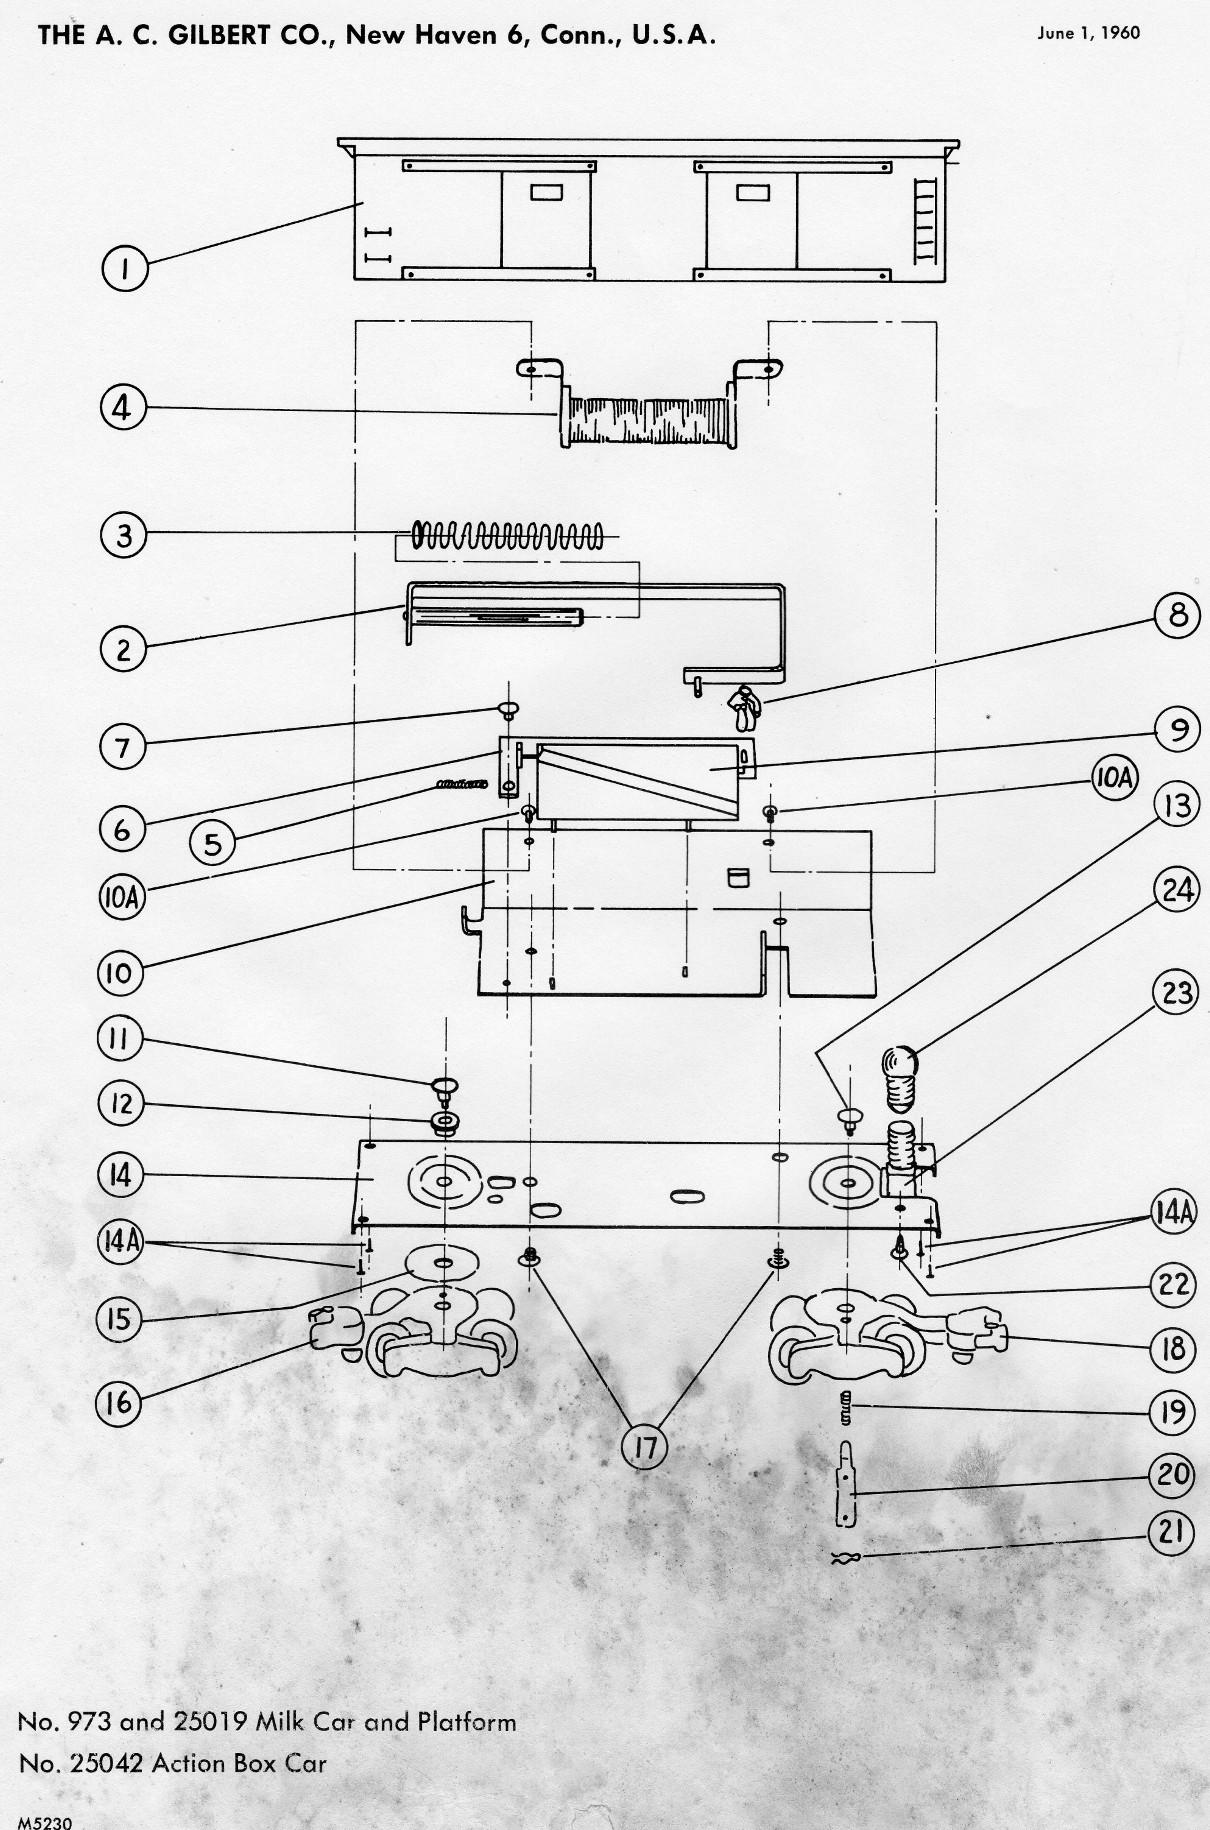 American Flyer Milk Car & Platform 973 and 25019 Diagram